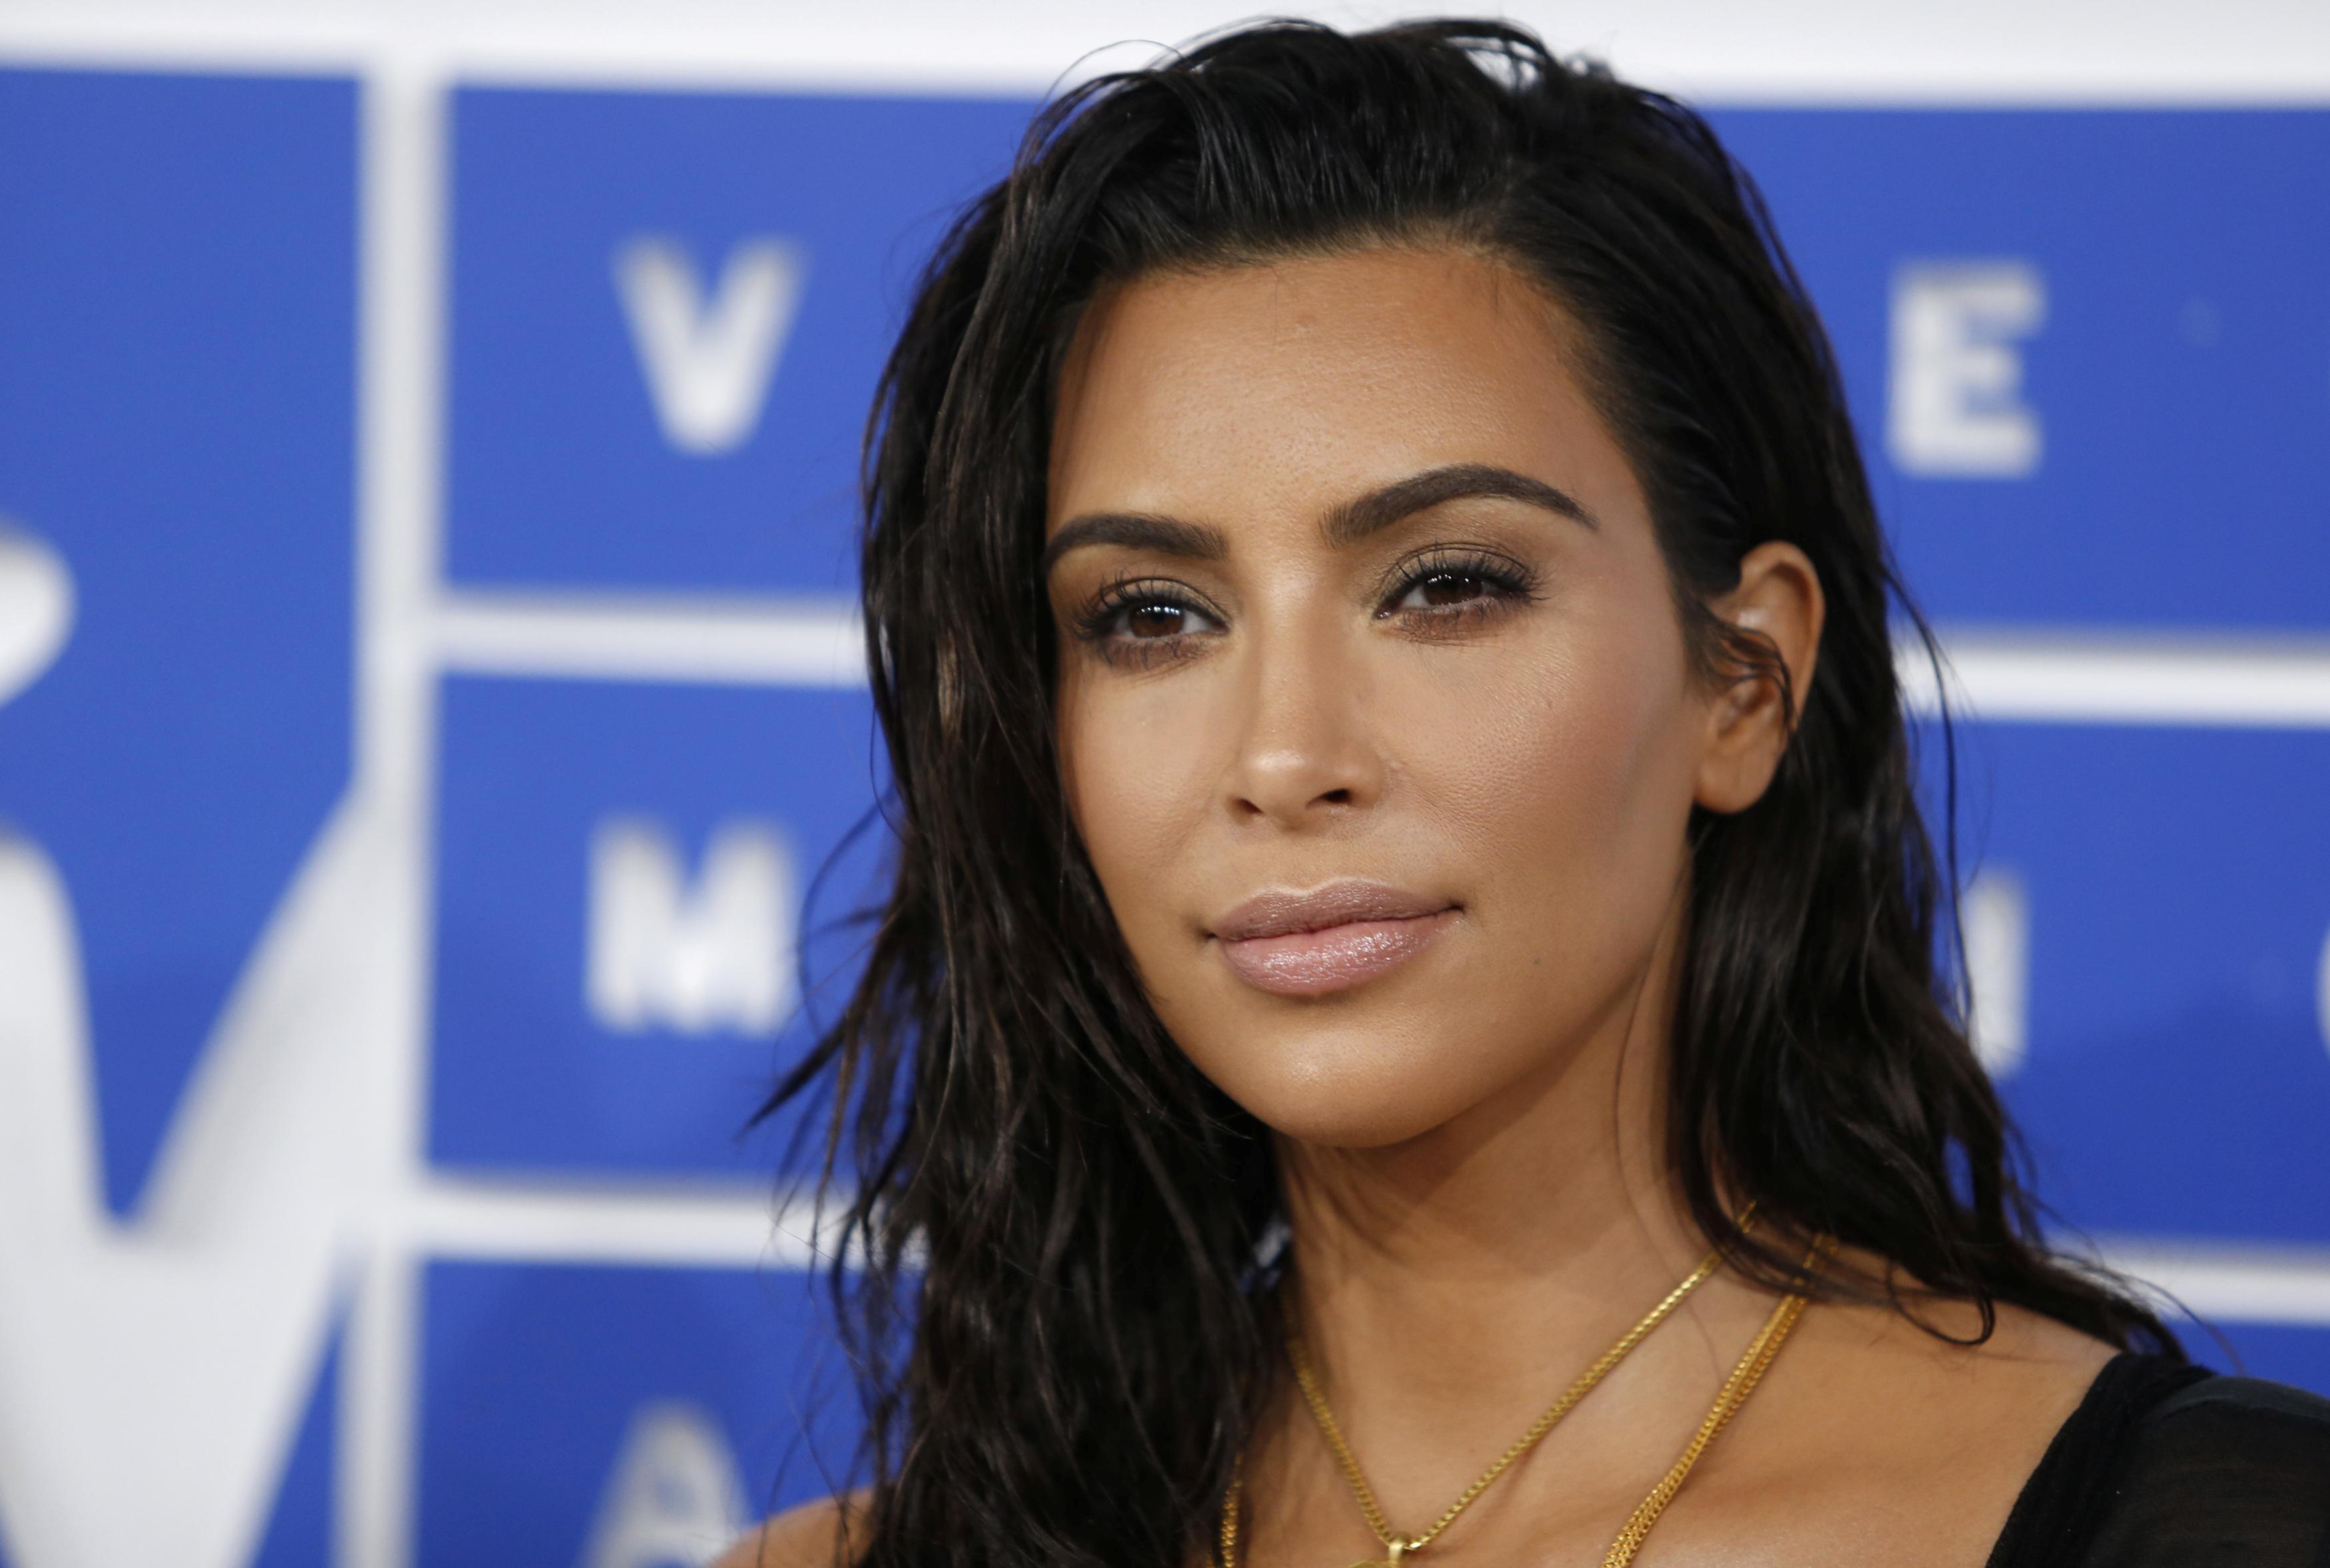 FILE PHOTO: Kim Kardashian arrives at the 2016 MTV Video Music Awards in New York, U.S., August 28, 2016.  REUTERS/Eduardo Munoz/File photo - RTX2QAI5